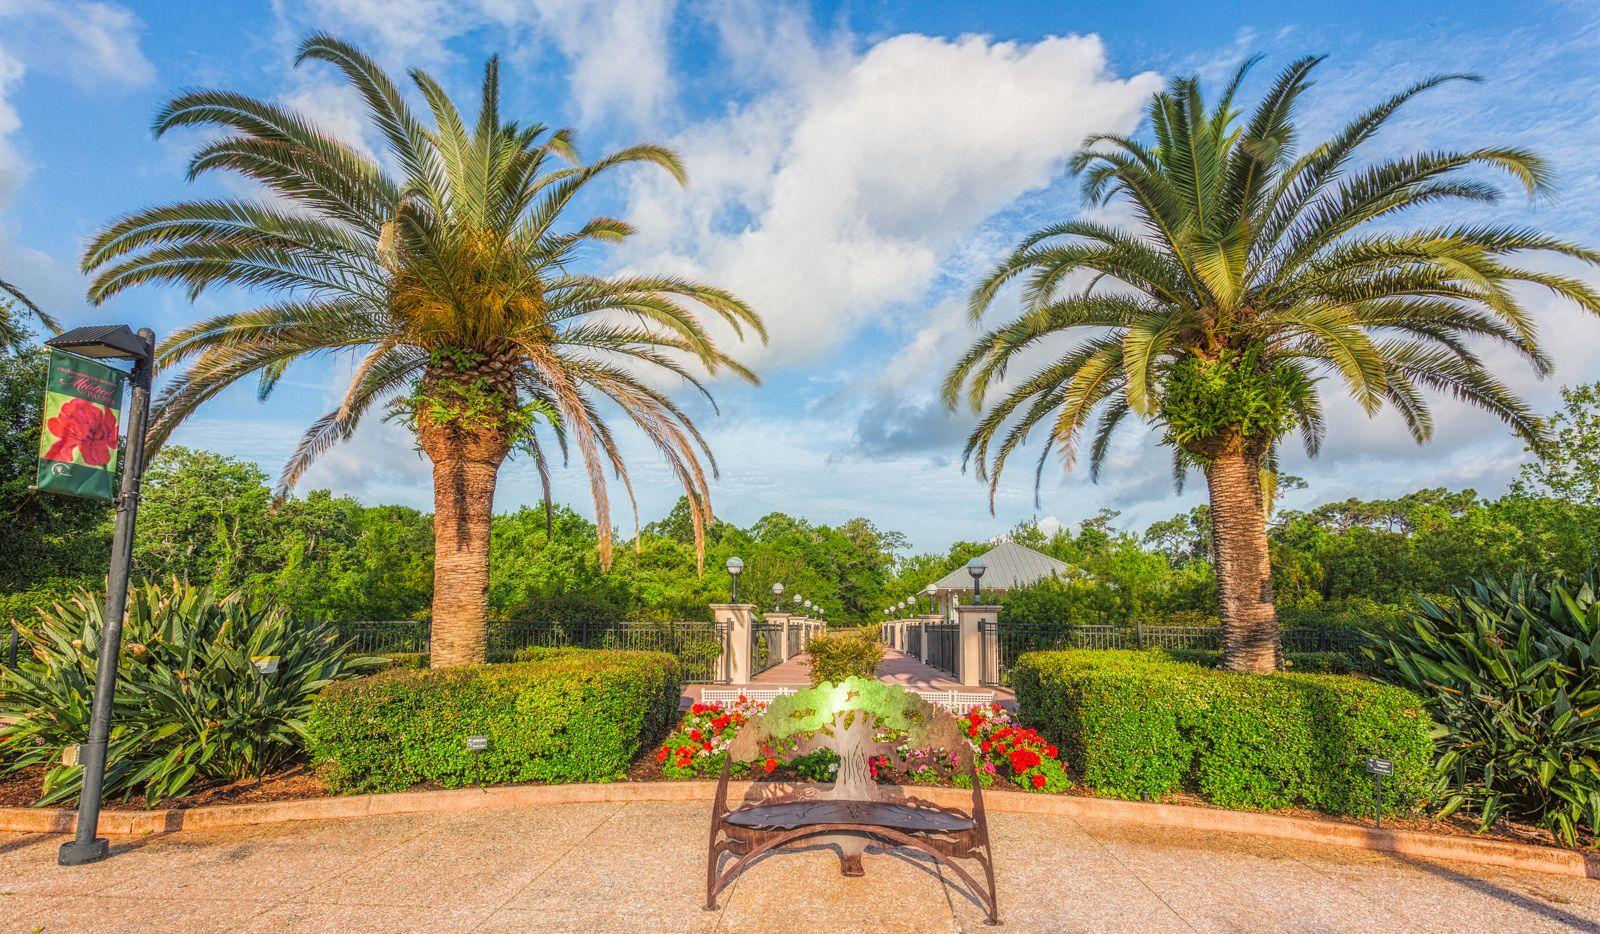 a08da45b2e8584d8731c1f27d61aa589 - The Florida Botanical Gardens In Largo